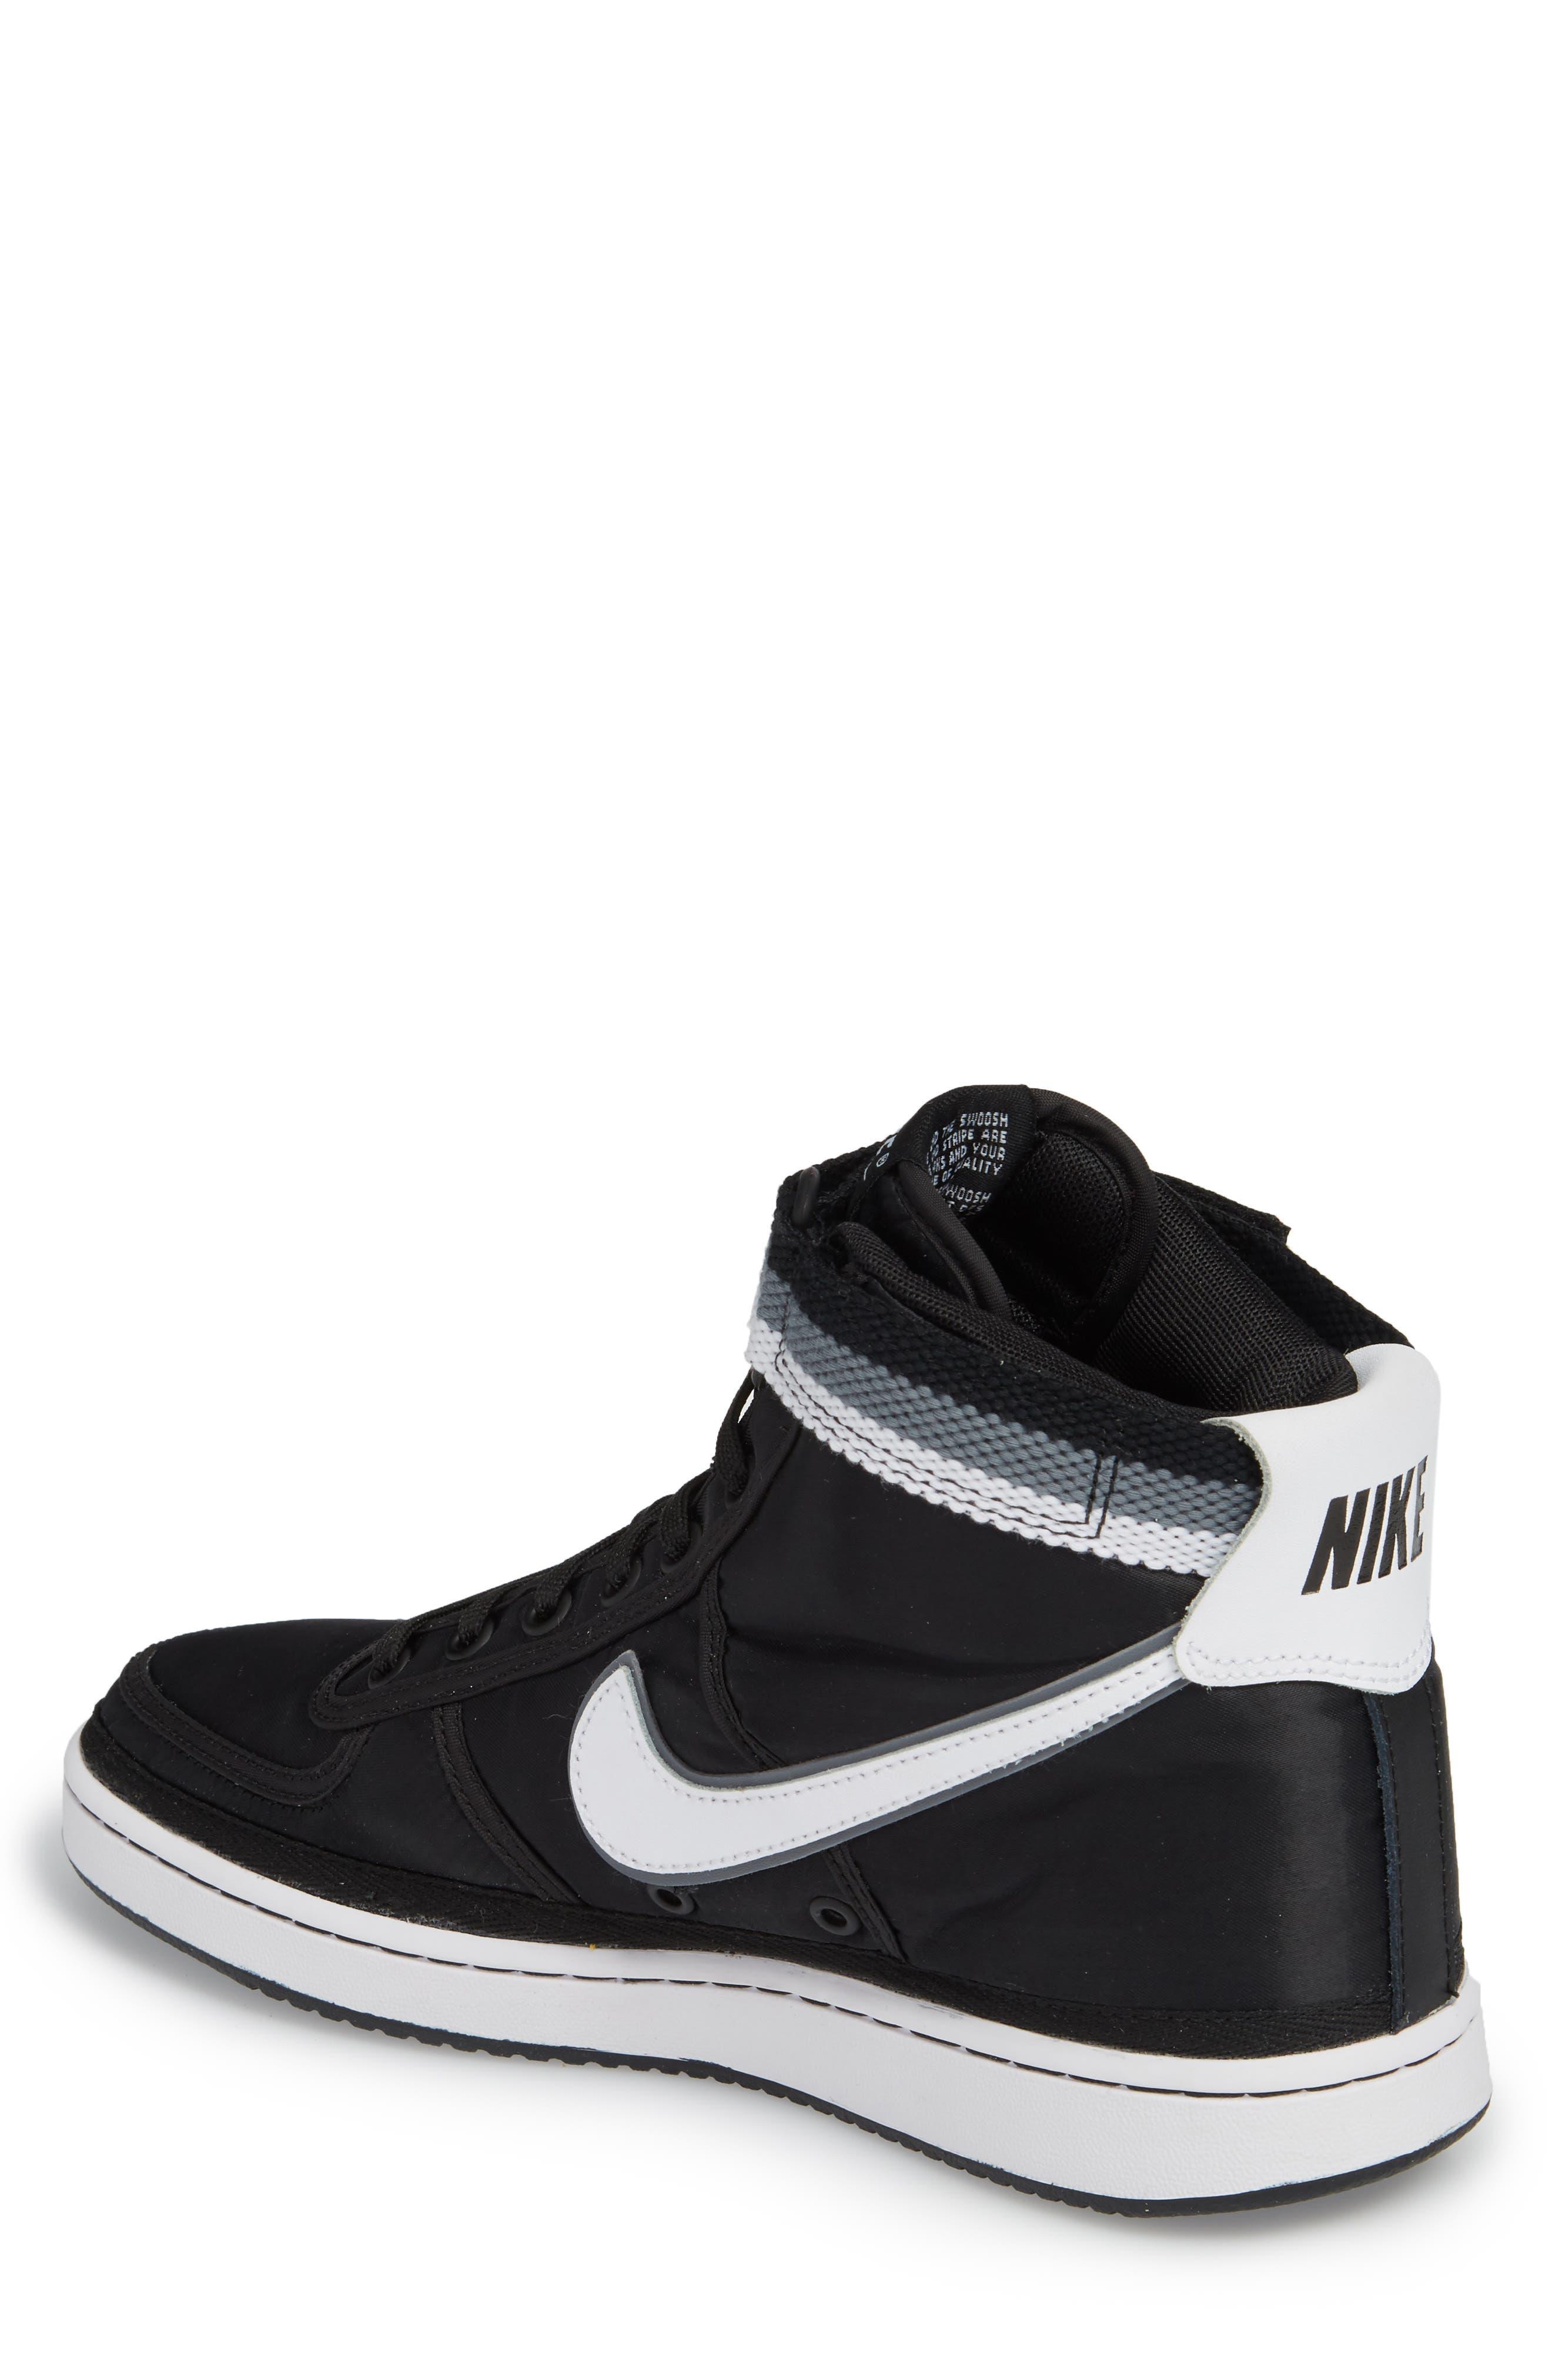 Vandal High Supreme High Top Sneaker,                             Alternate thumbnail 2, color,                             001